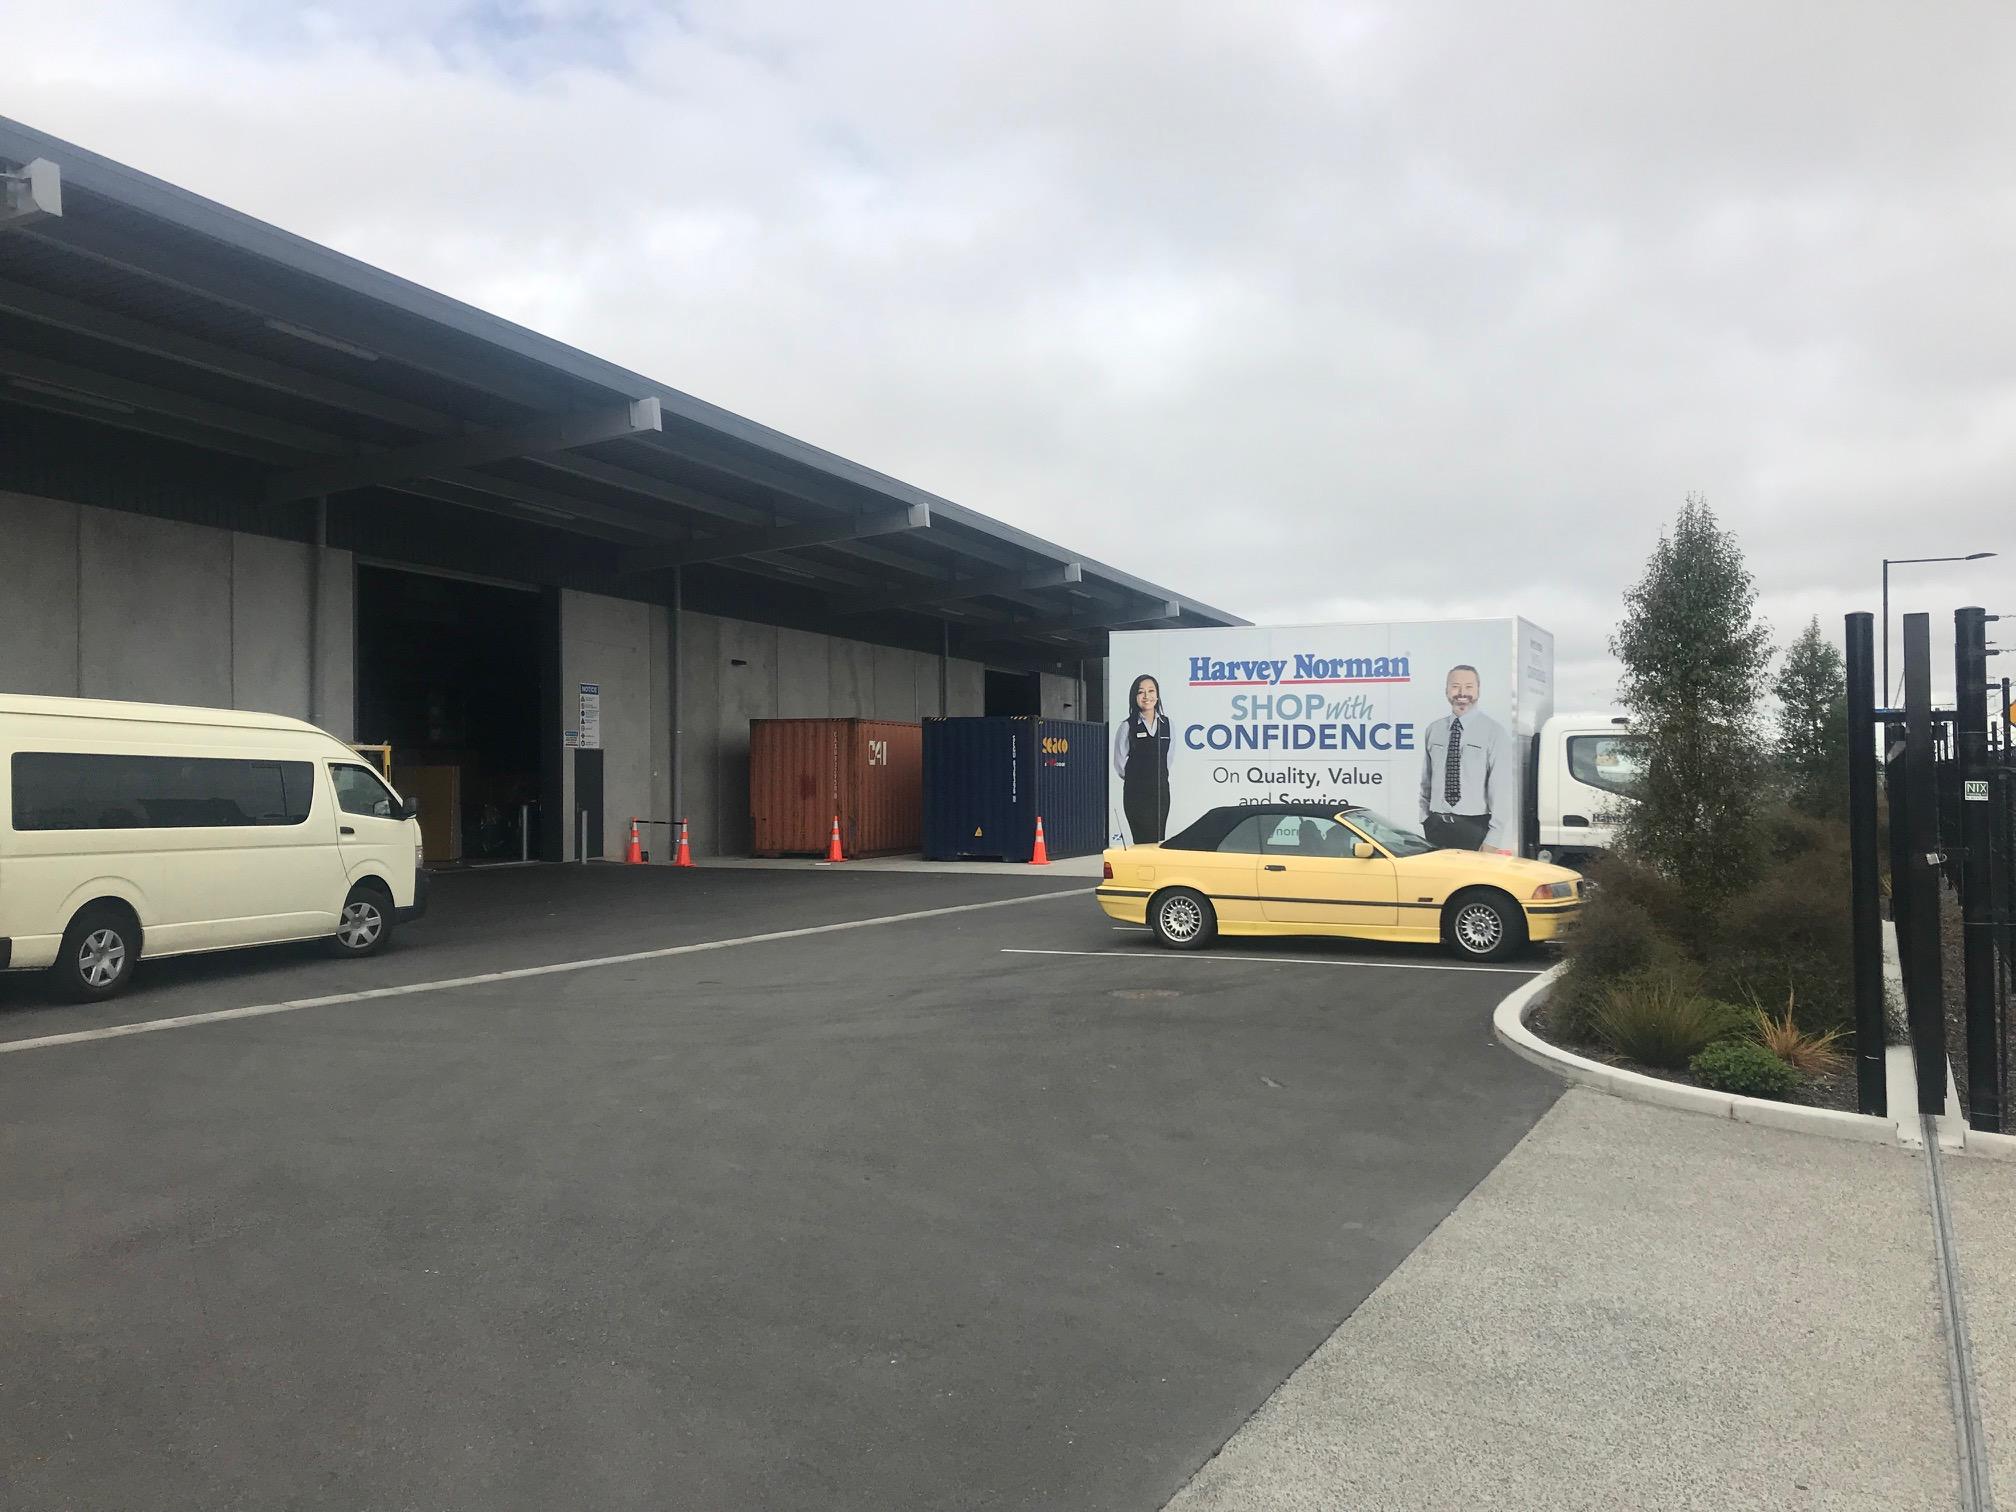 Harvey Norman Waterloo, Christchurch   (Harvey Norman Holding Pty Ltd)